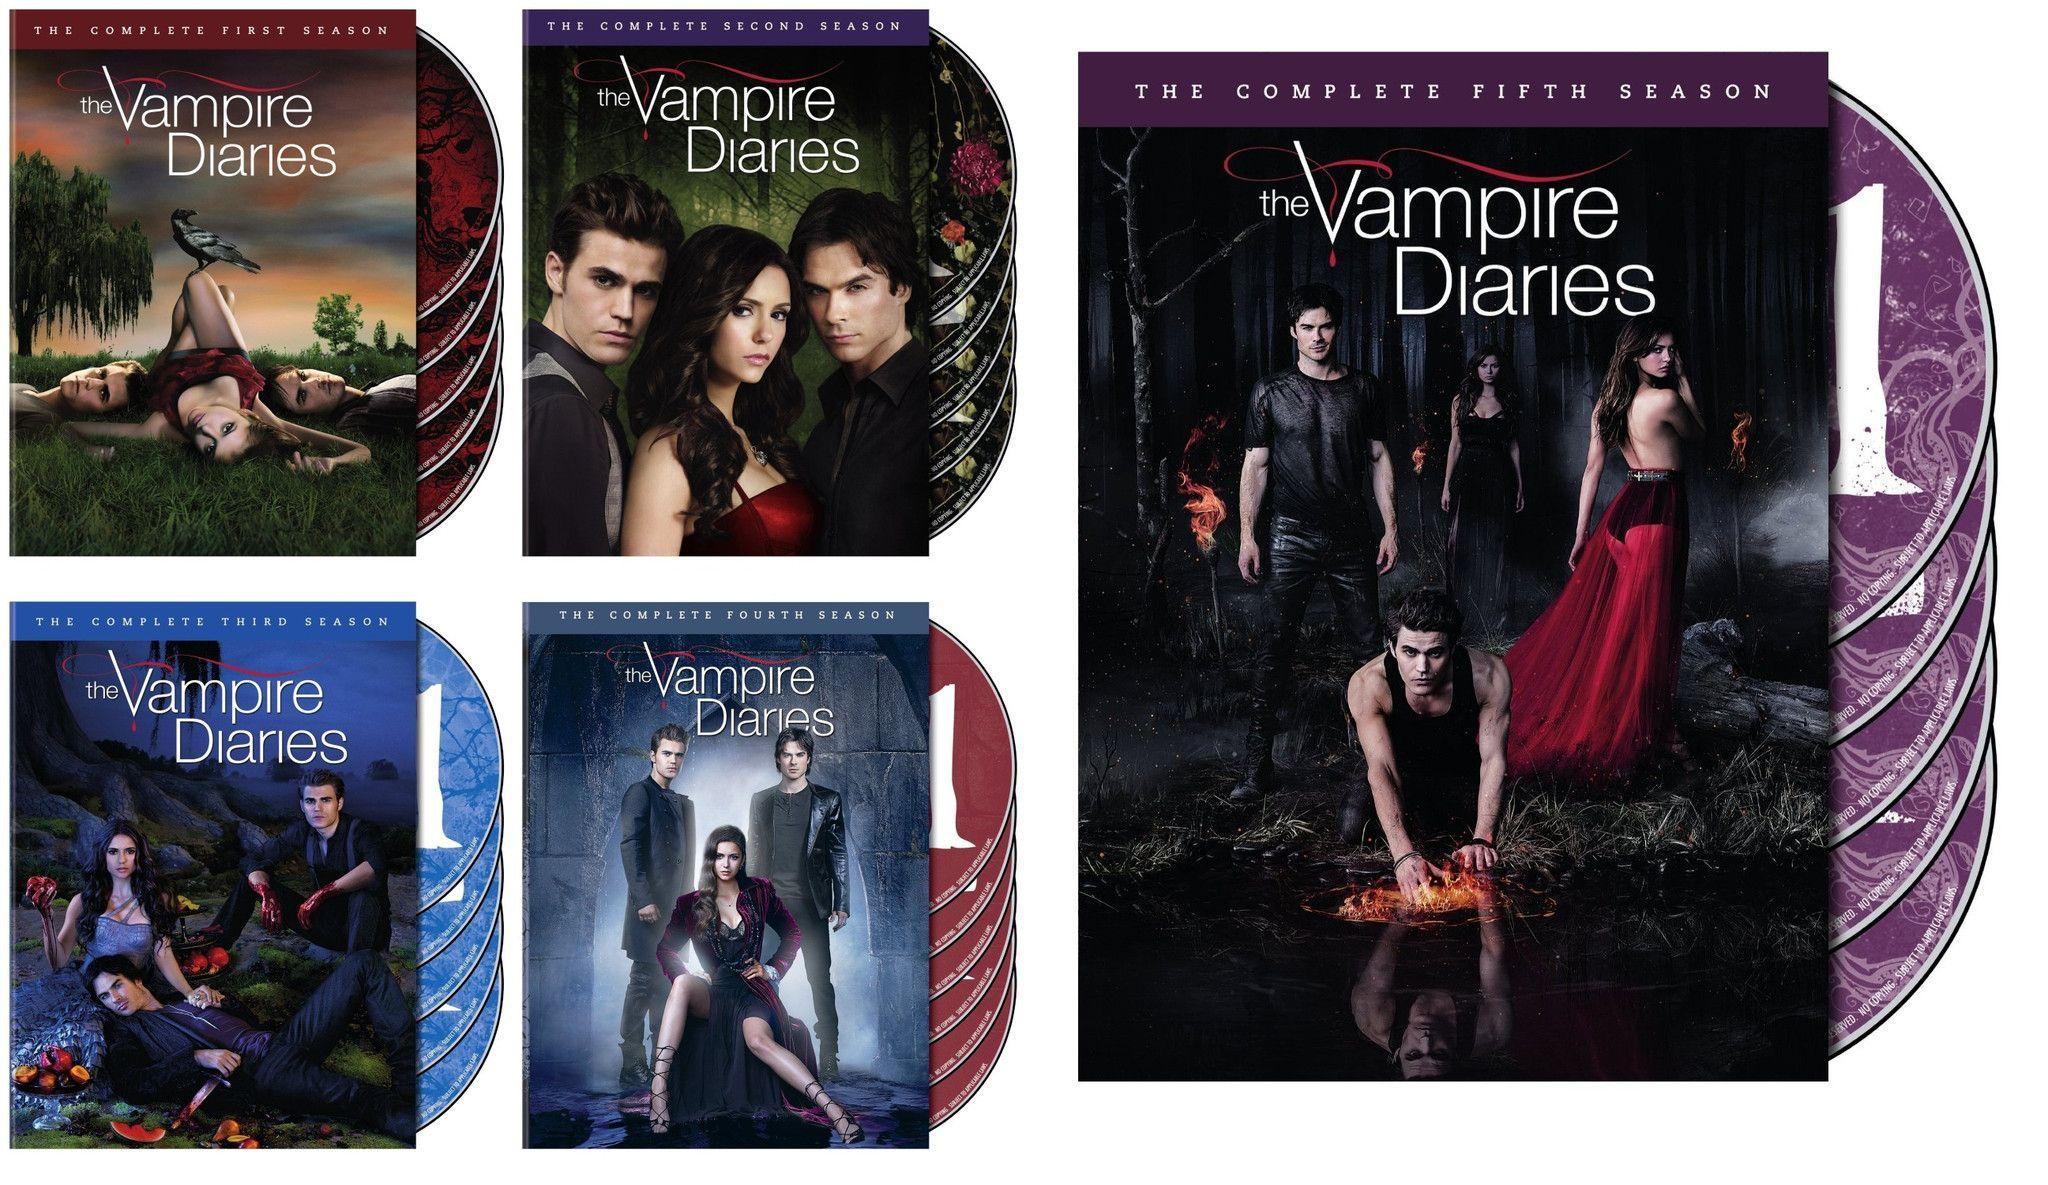 Vampire Diaries Tv Series Complete Dvd Box Set Vampire Diaries Vampire Diaries Books Vampire Diaries Seasons